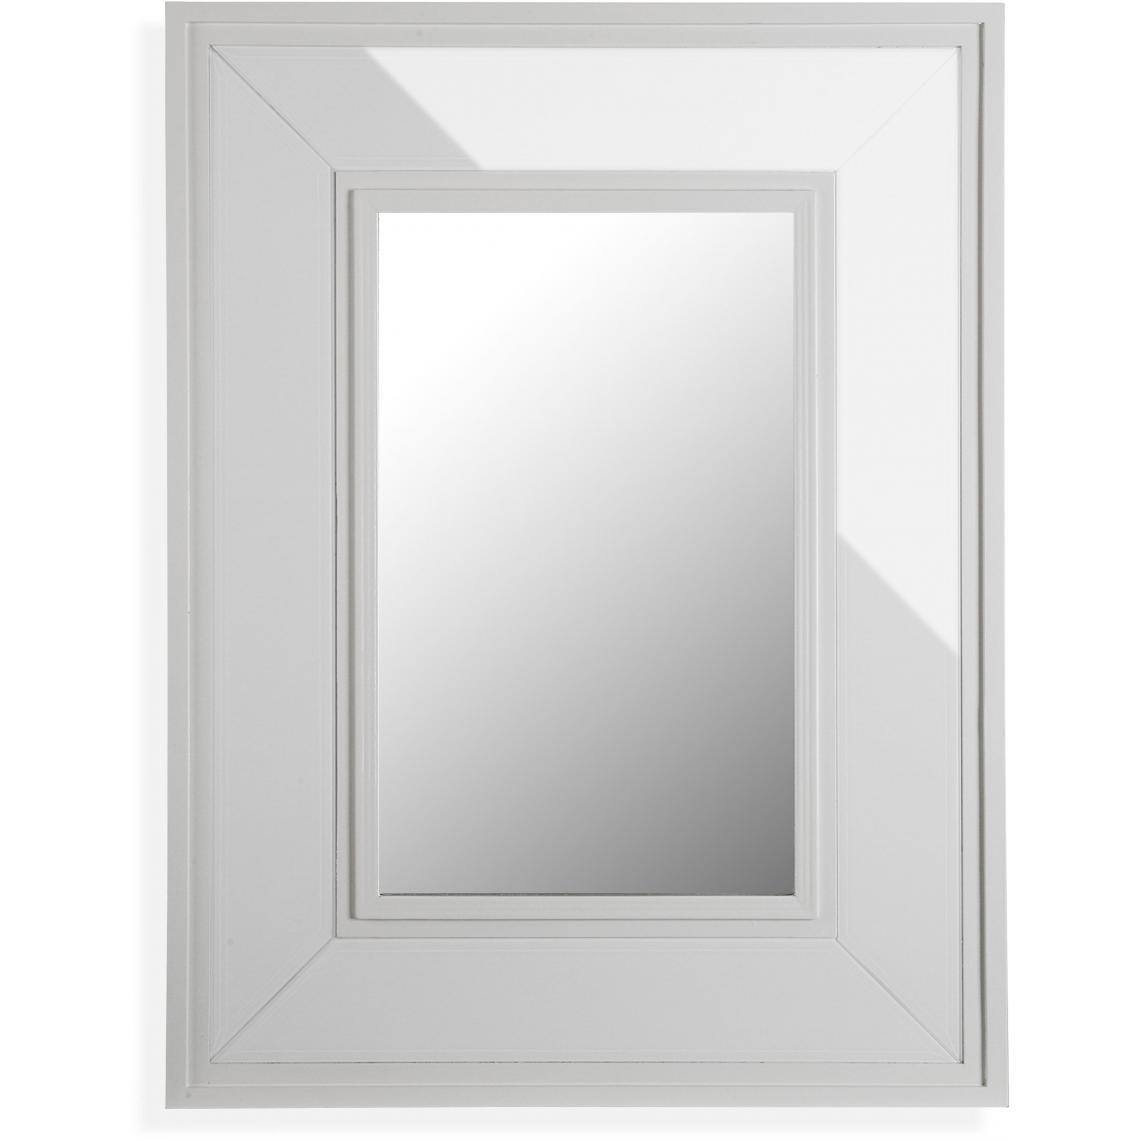 Miroir Mural Cadre Blanc Sino 3 Suisses